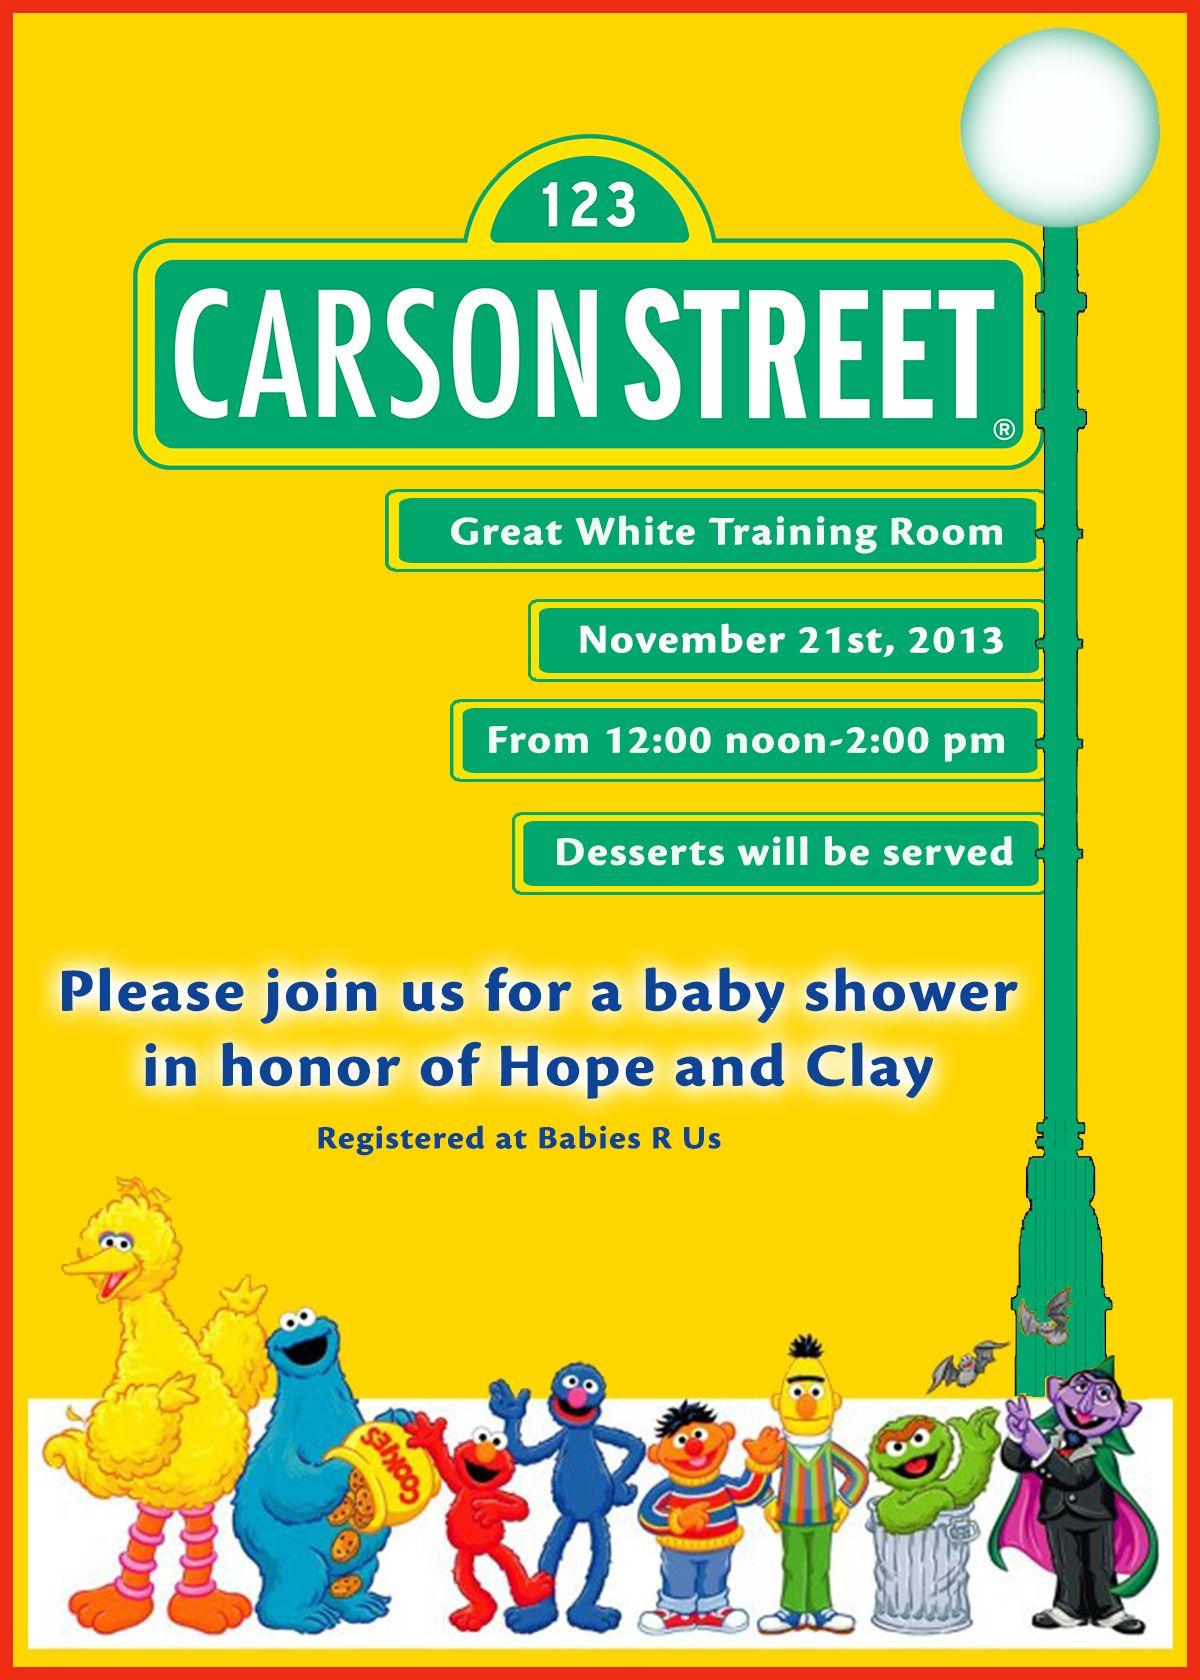 Sesame Street Baby Shower Baby shower 4 Caiden